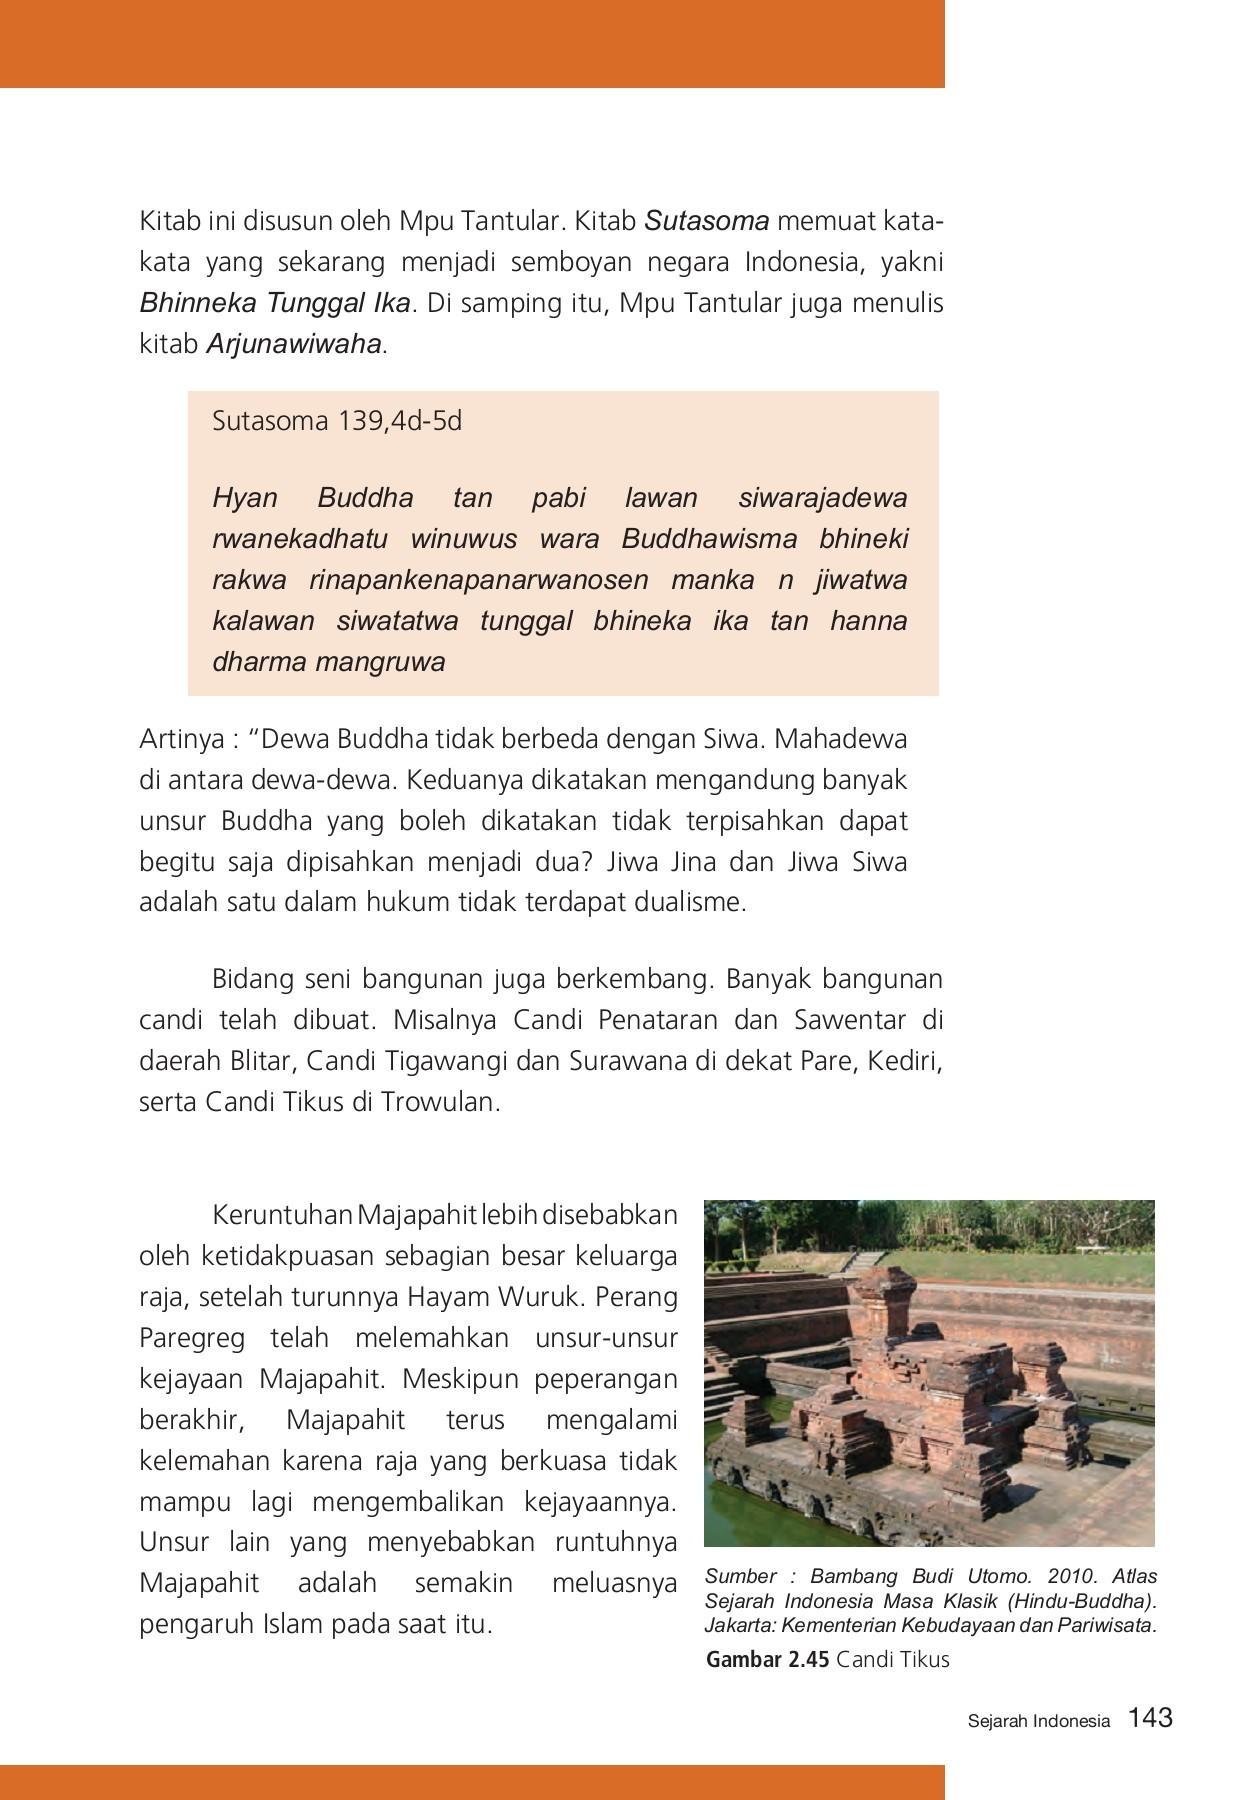 Bhineka Tunggal Ika Dari Kitab : bhineka, tunggal, kitab, Bhineka, Tunggal, Terdapat, Dalam, Kitab, IlmuSosial.id